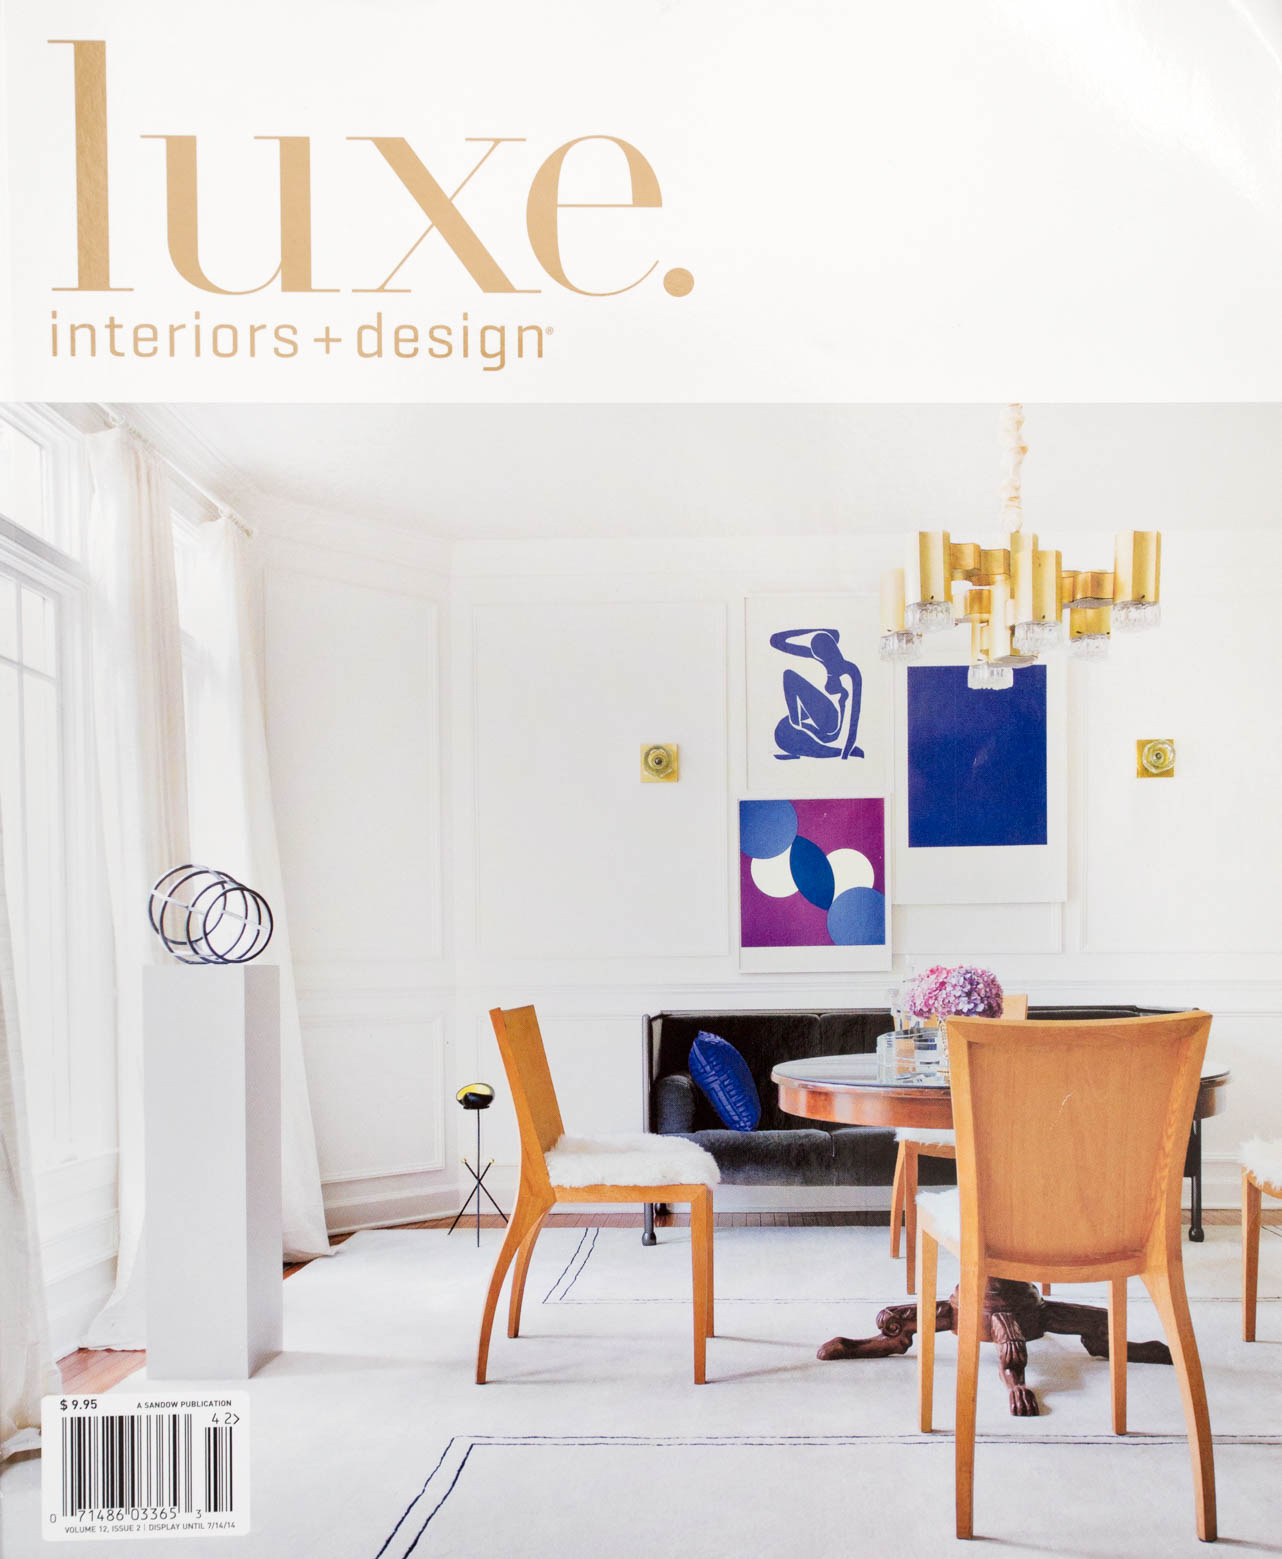 luxe-magazine-cover-dining-room-dc-interior-design.jpg